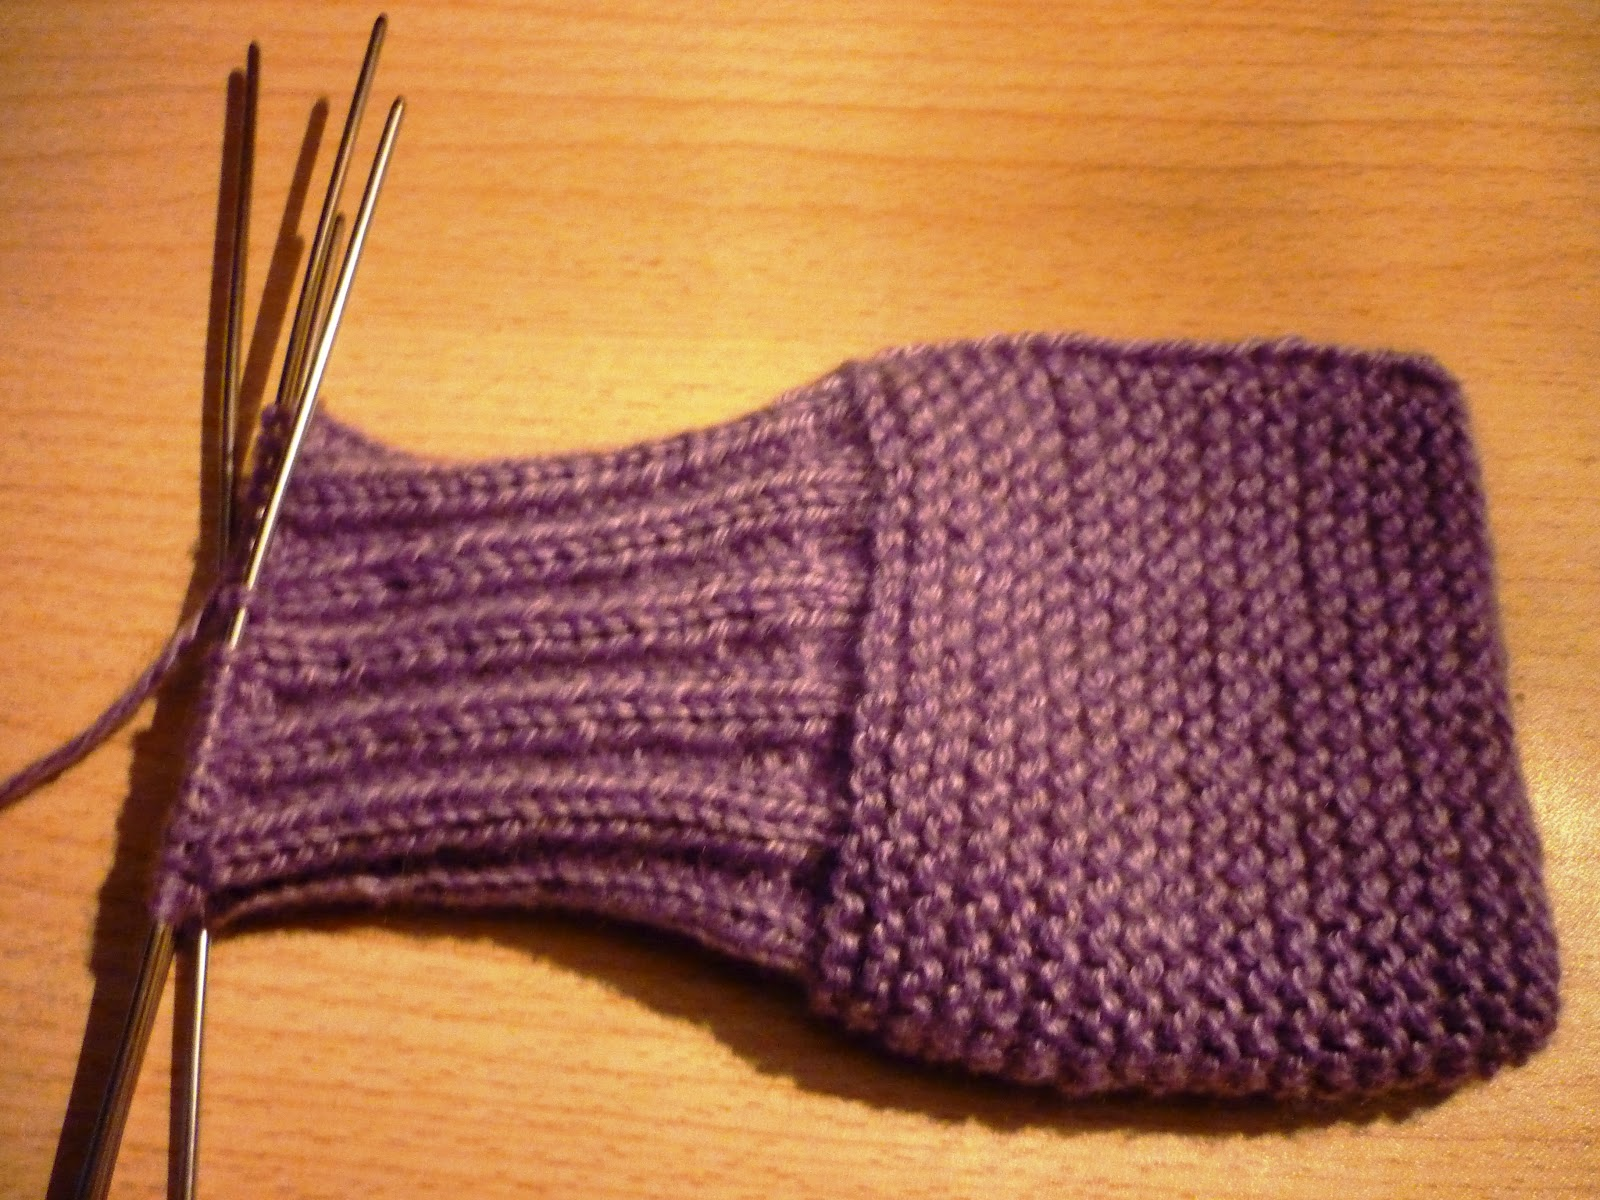 вязание легко и просто